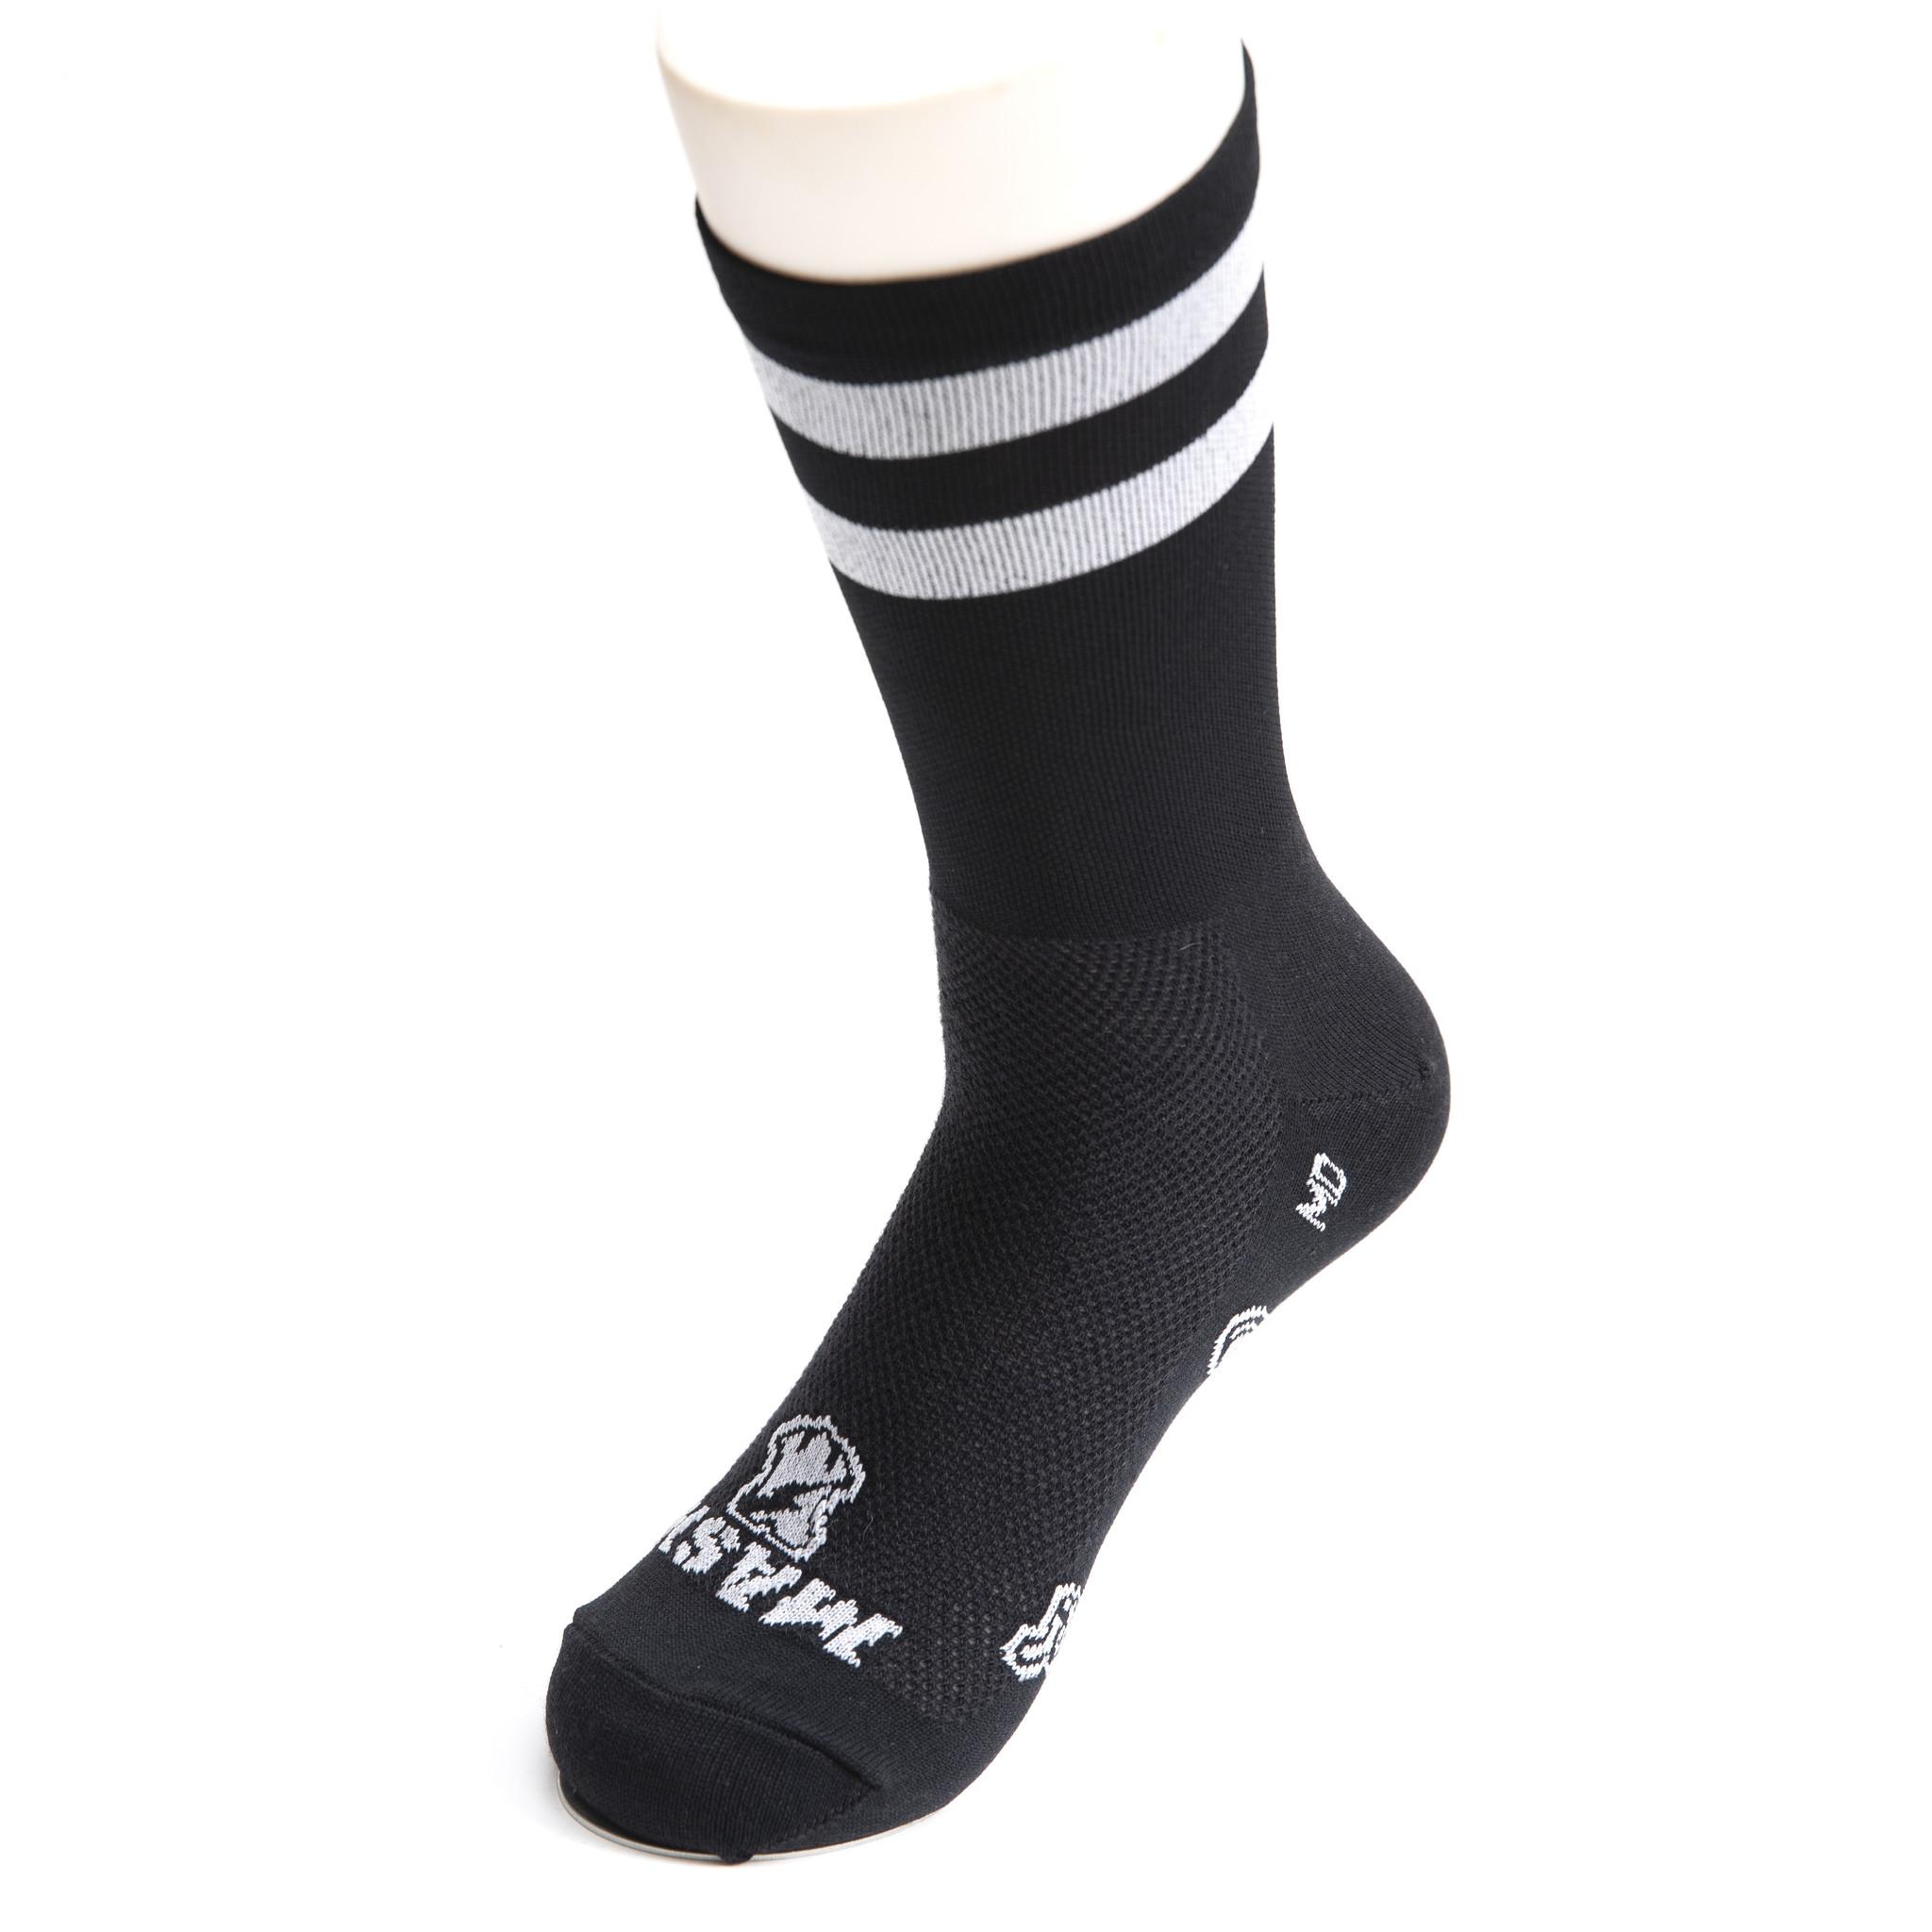 MASH Gym Sock Black